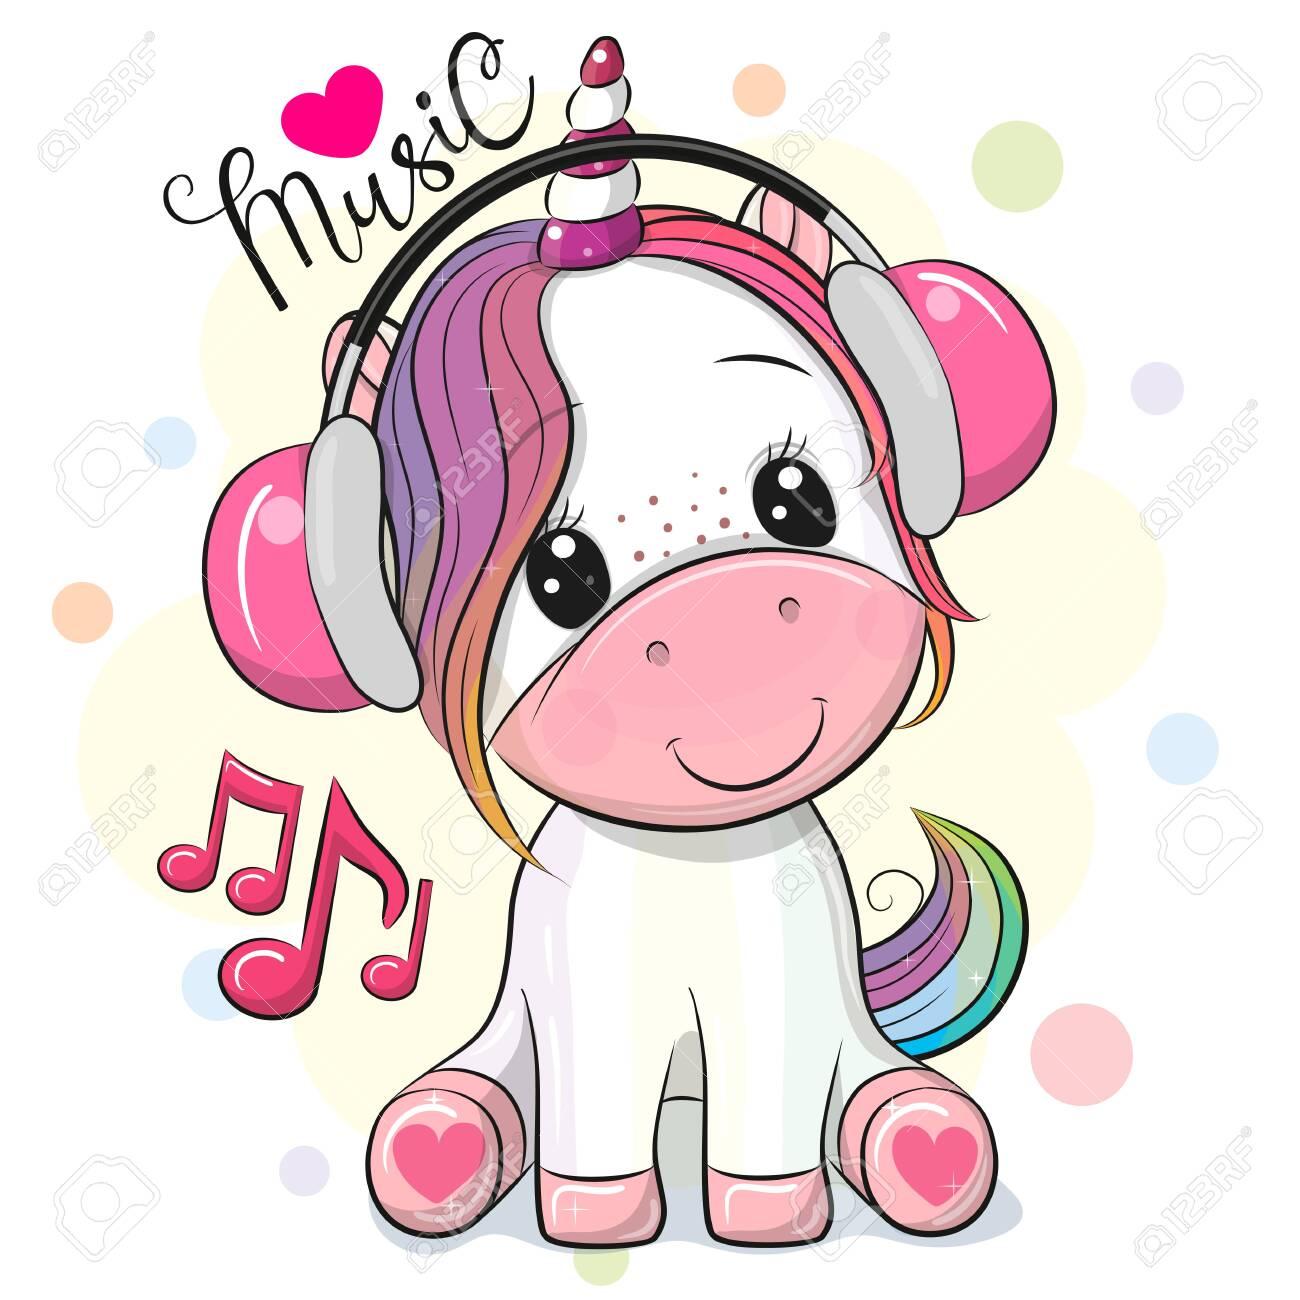 Cute Cartoon Unicorn with headphones on a white background - 148093829